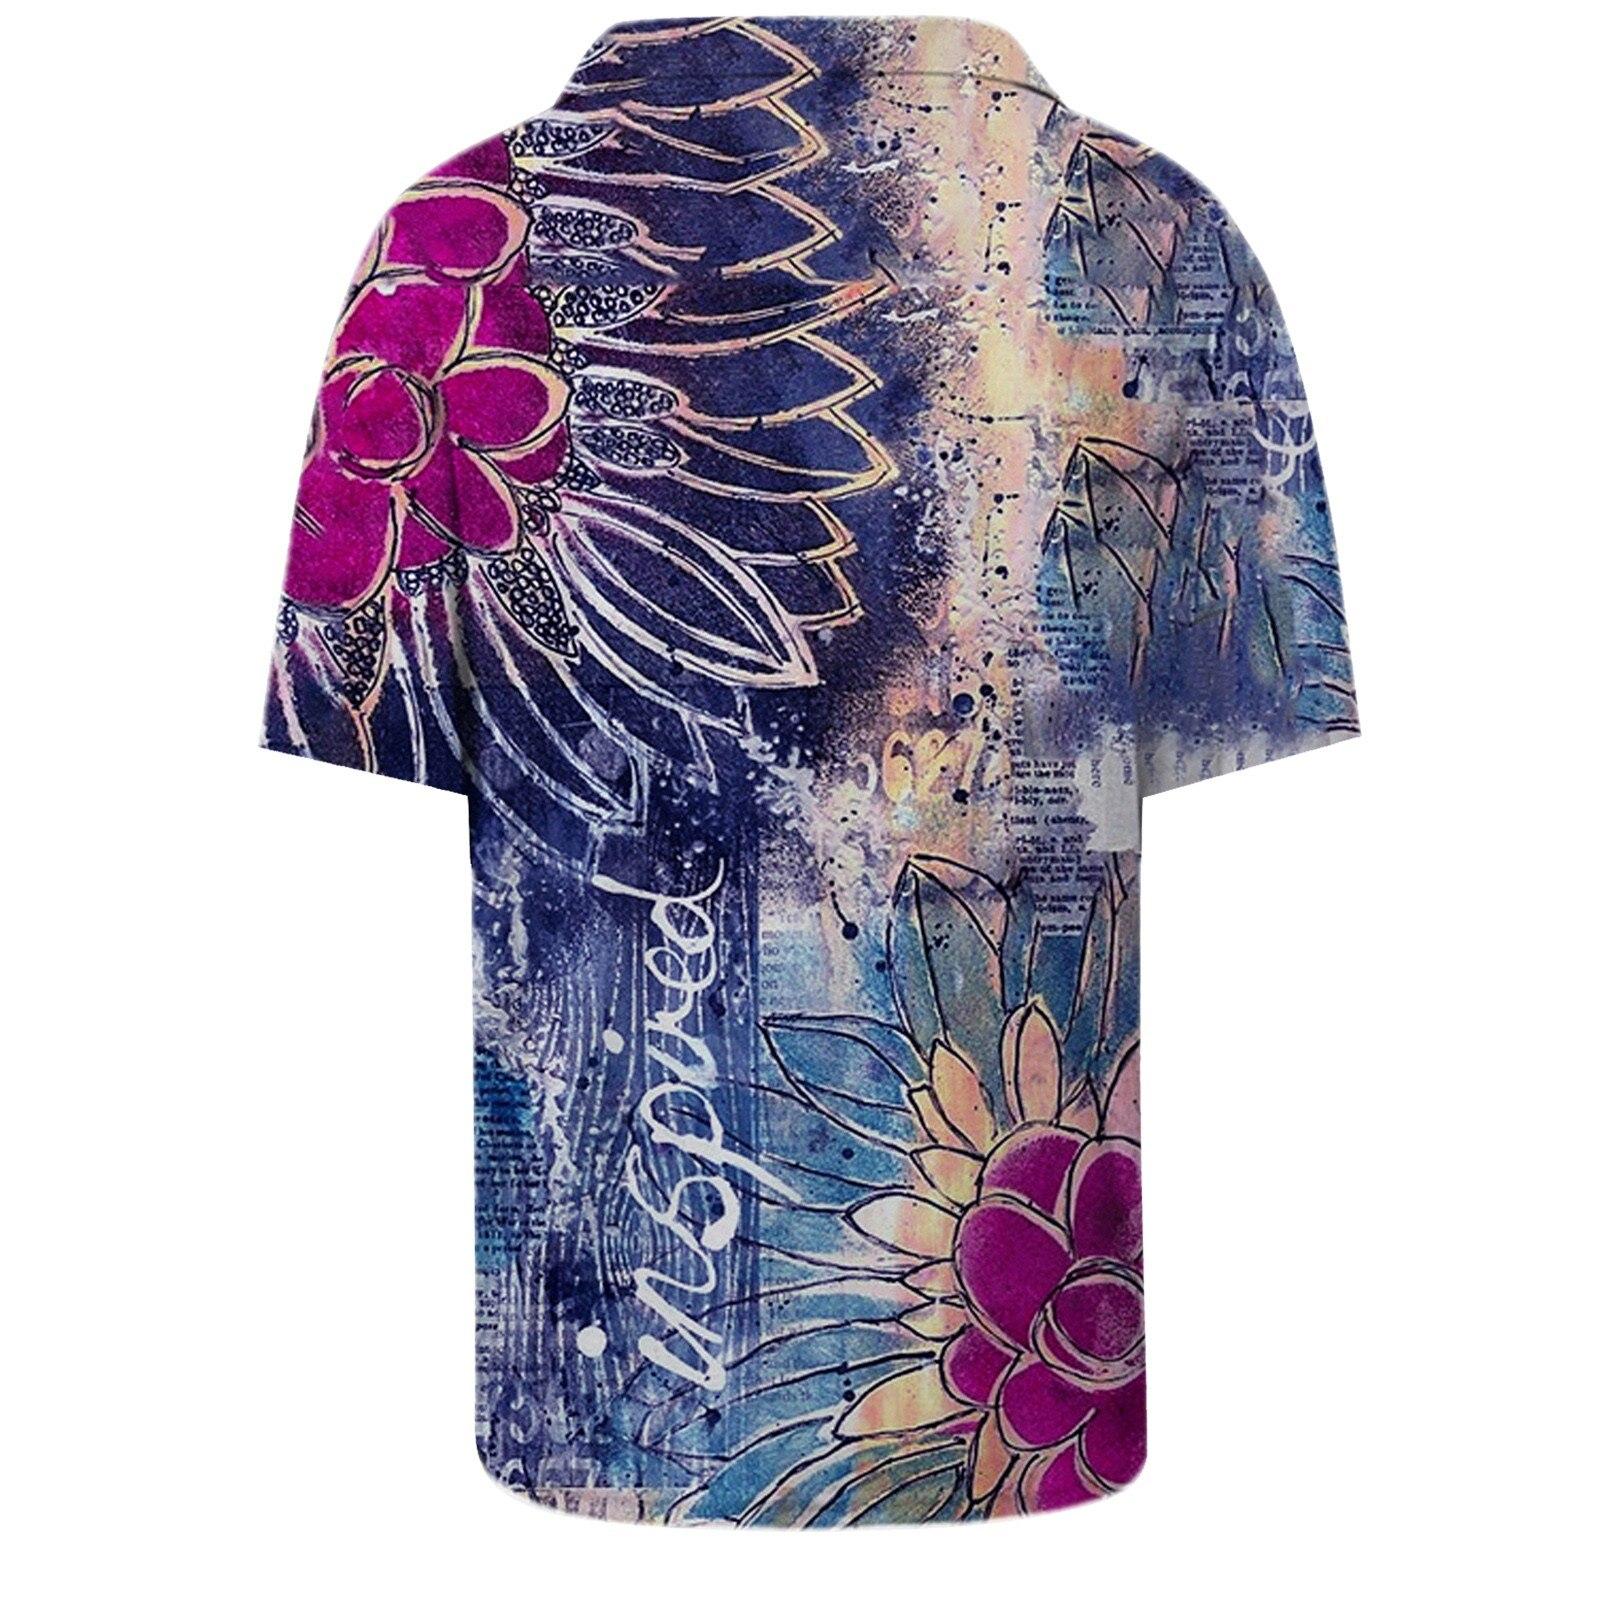 2021 Women's Shirt Fashion Autumn Retro Loose Deep V-Neck T Shirts Patchwork Retro Printing Long-Sleeved Shirt Ladies Shirts